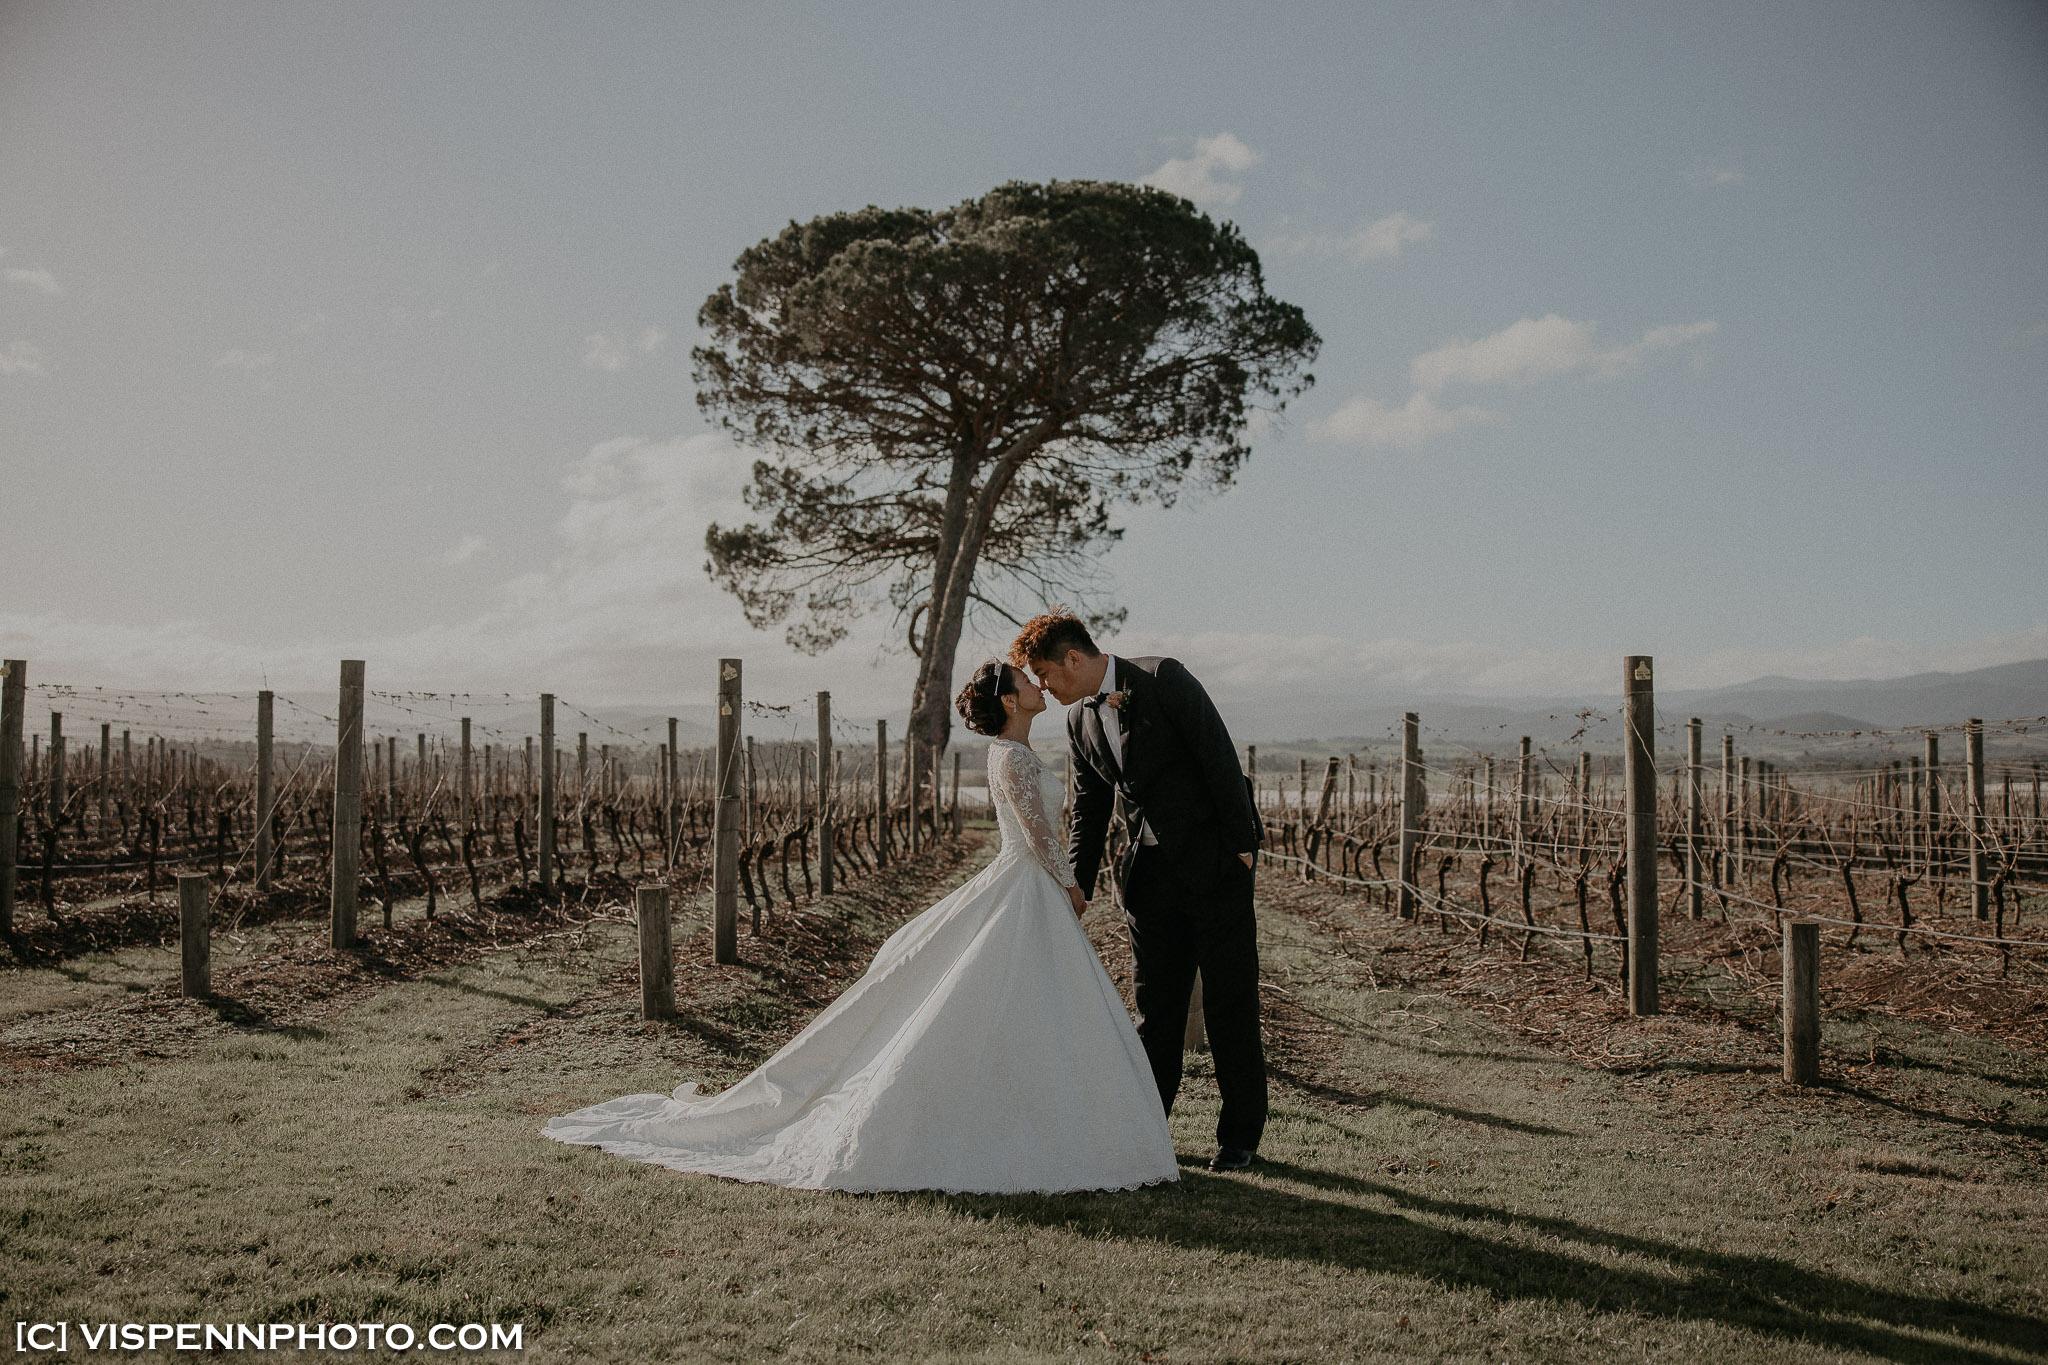 WEDDING DAY Photography Melbourne CoreyCoco 1P 02269 EOSR ZHPENN